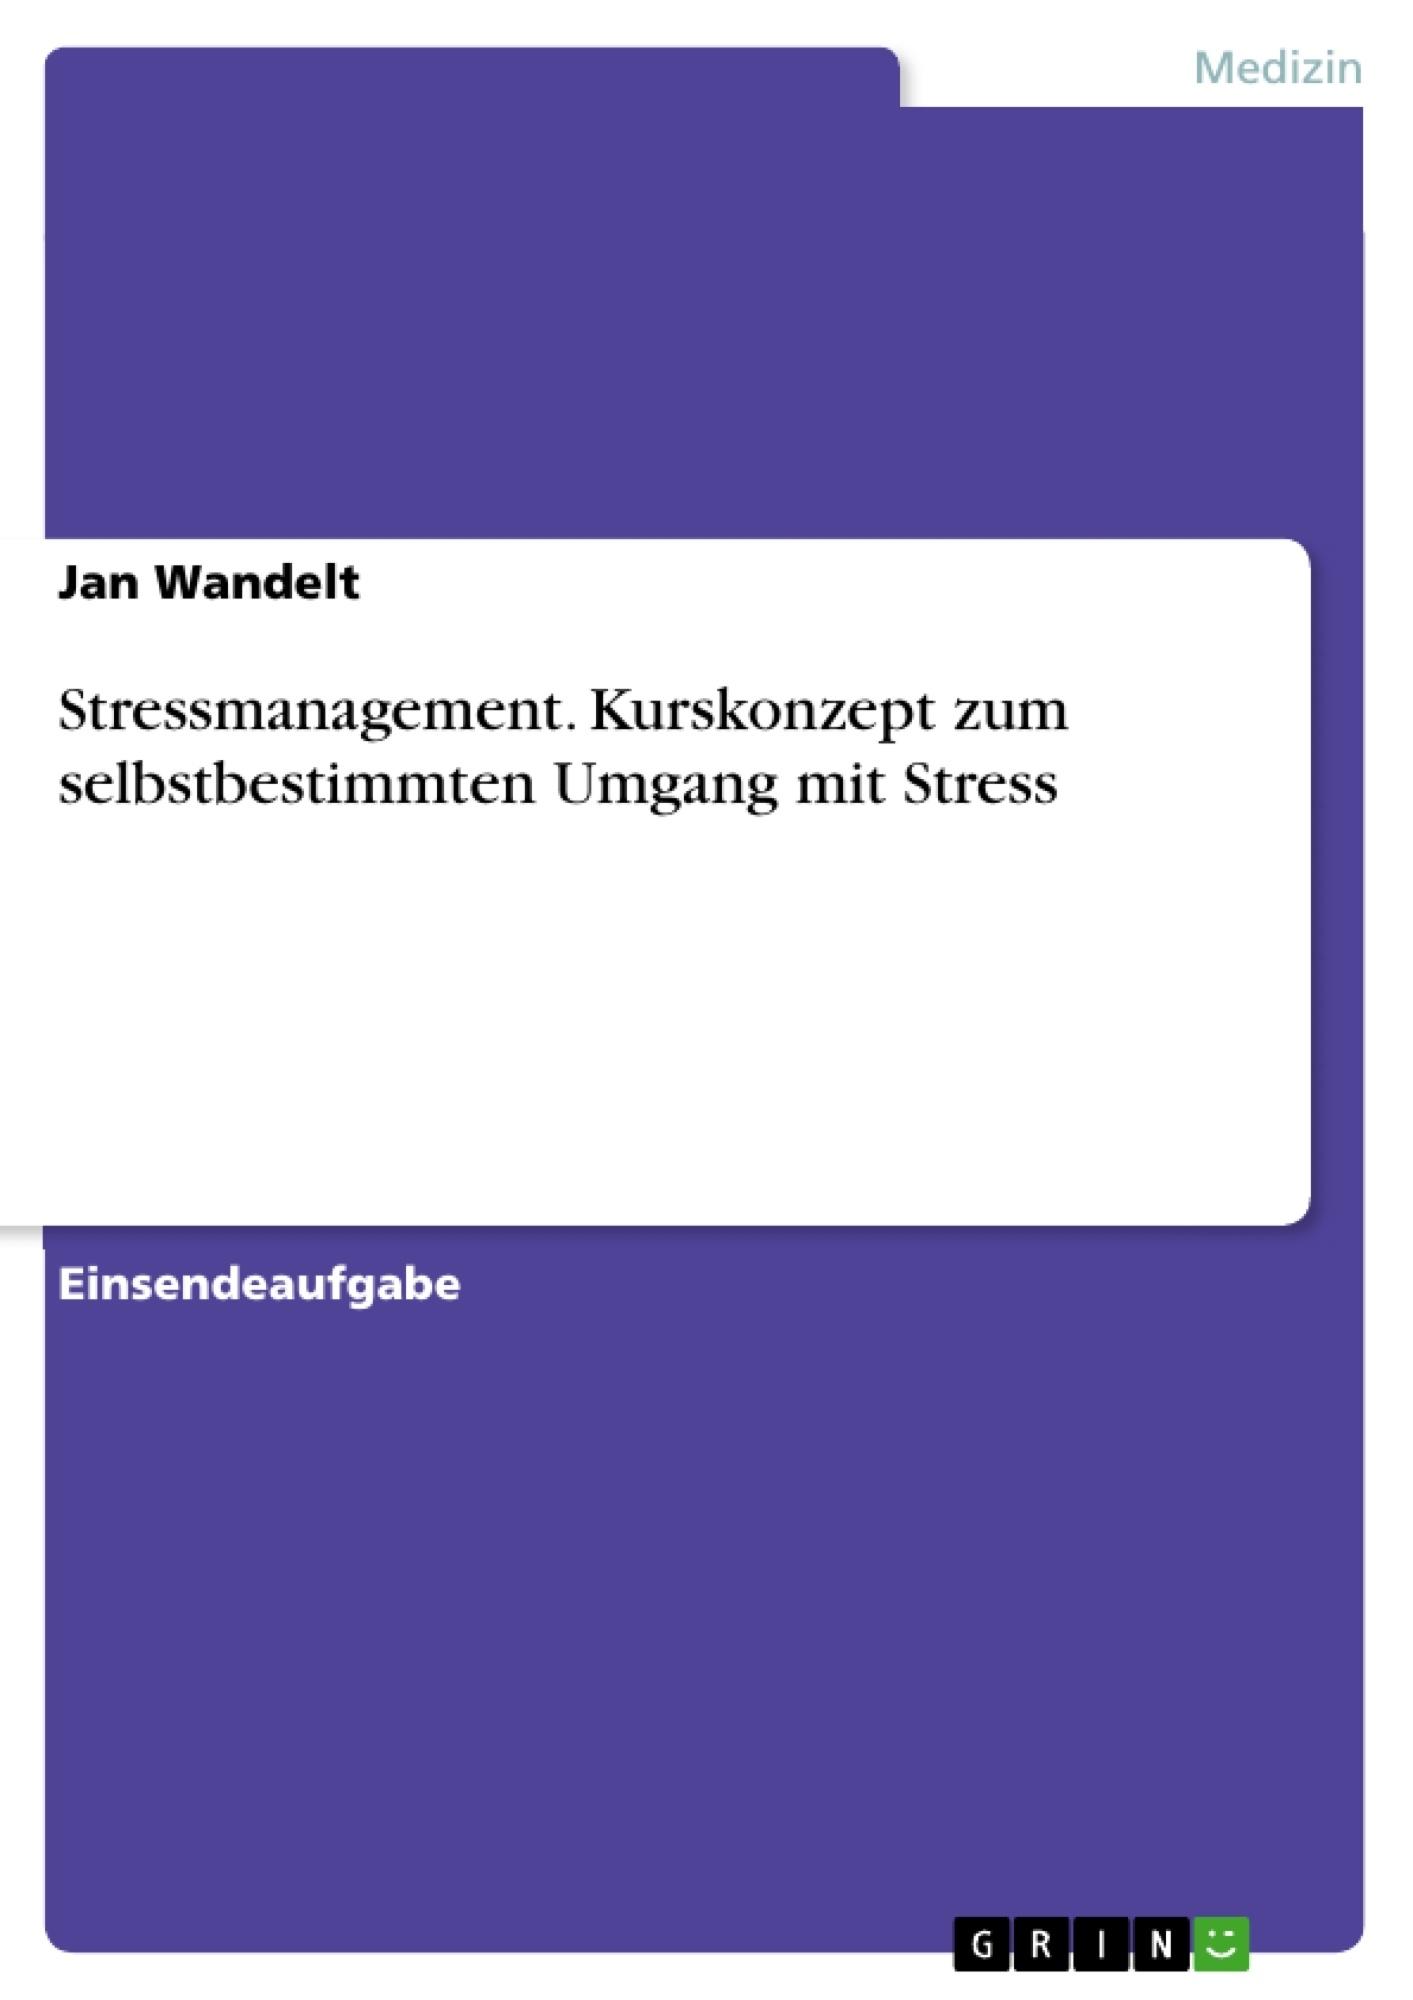 Titel: Stressmanagement. Kurskonzept zum selbstbestimmten Umgang mit Stress